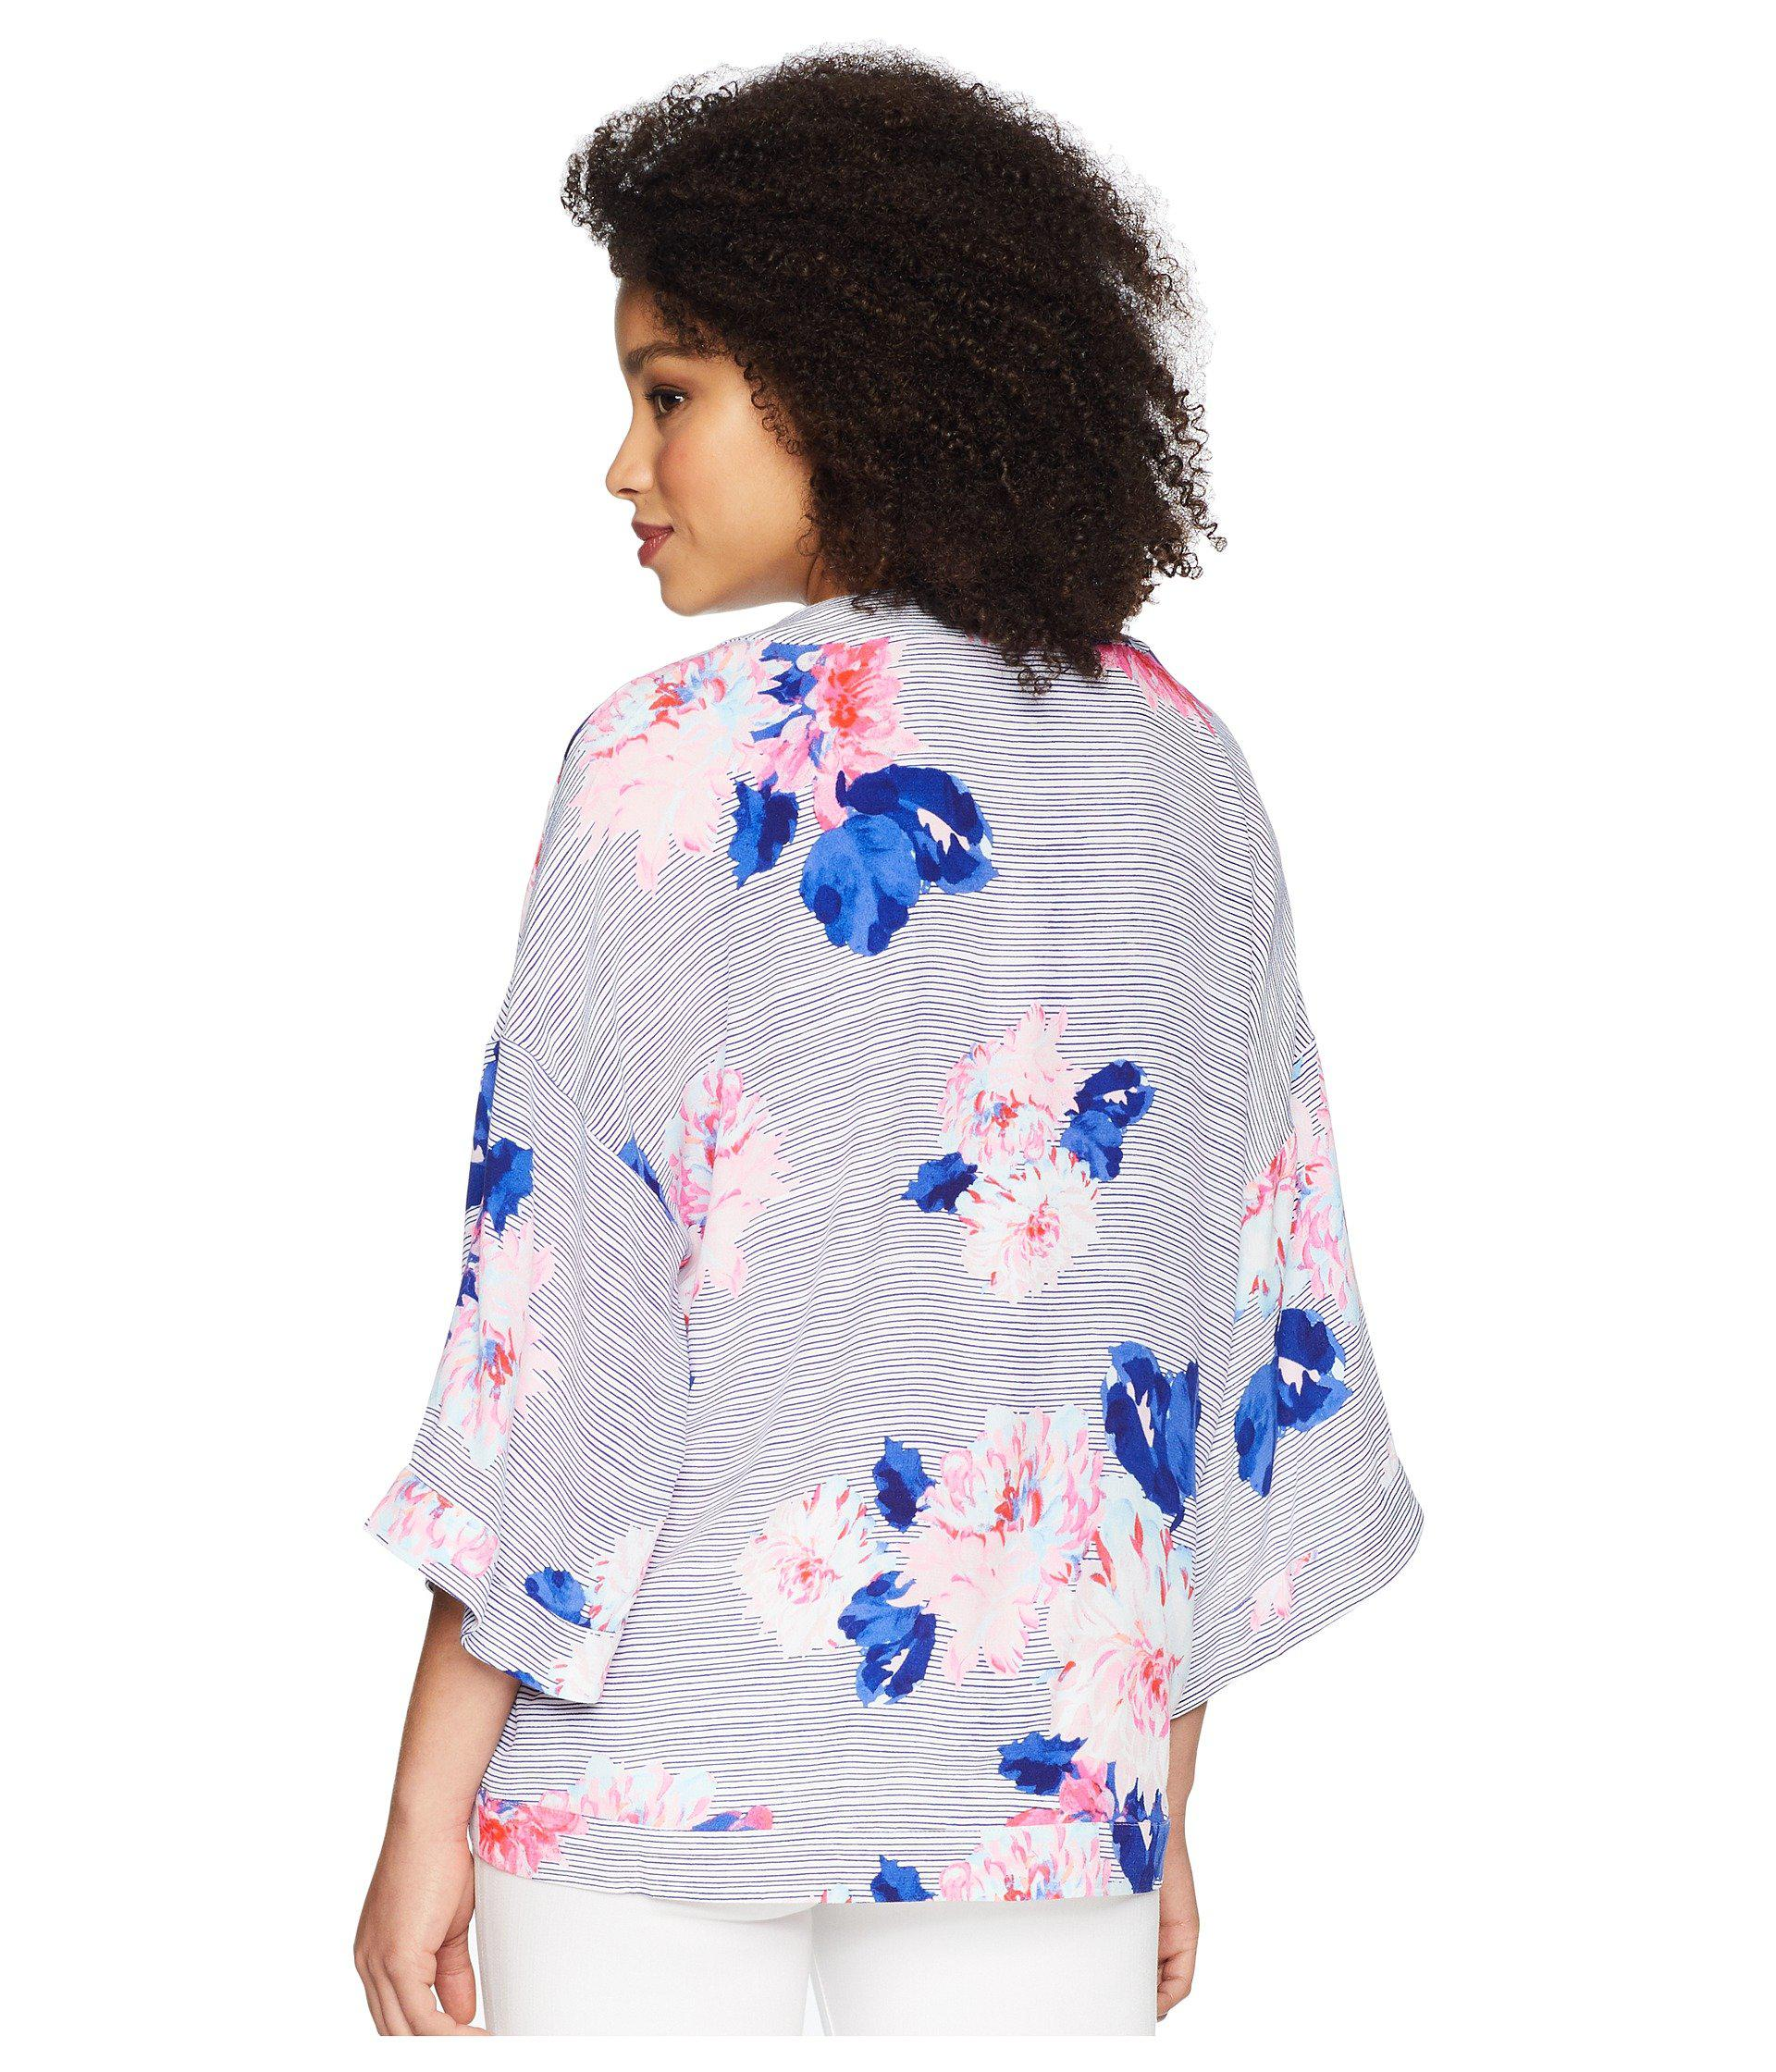 6e05e41ec85 Lyst - Joules Kimmy Kimono Style Top - Save 42%